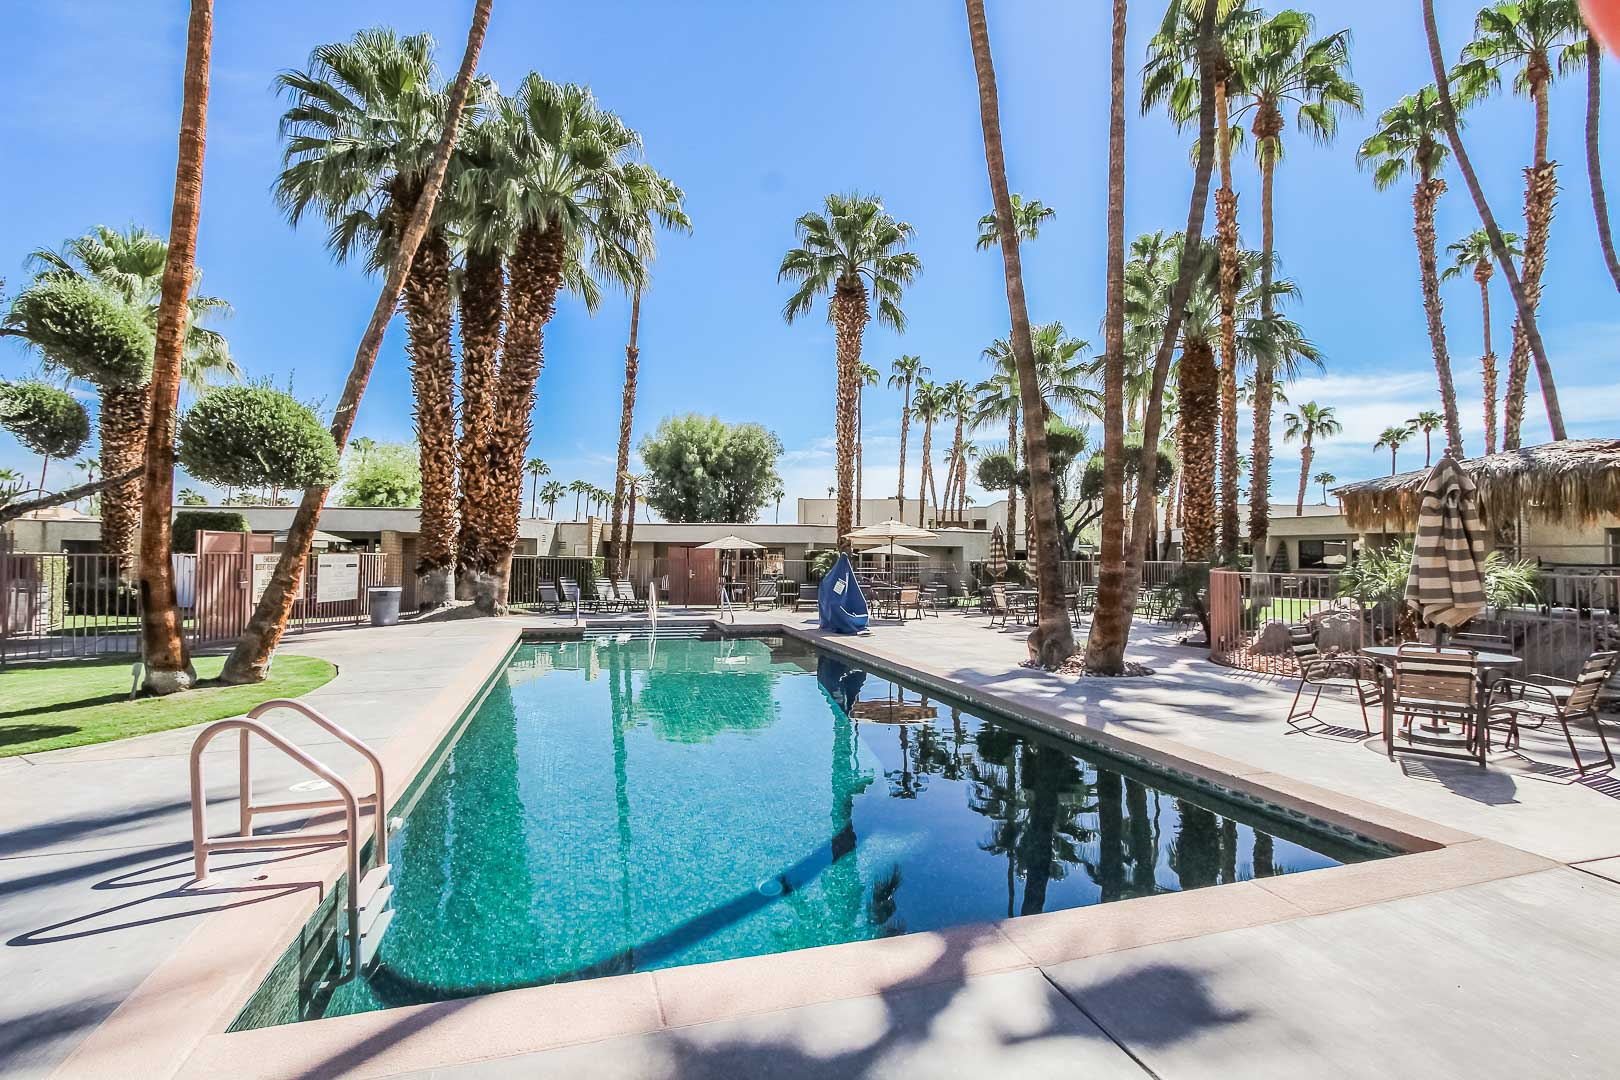 A refreshing outside view at VRI's Desert Isle Resort in California.